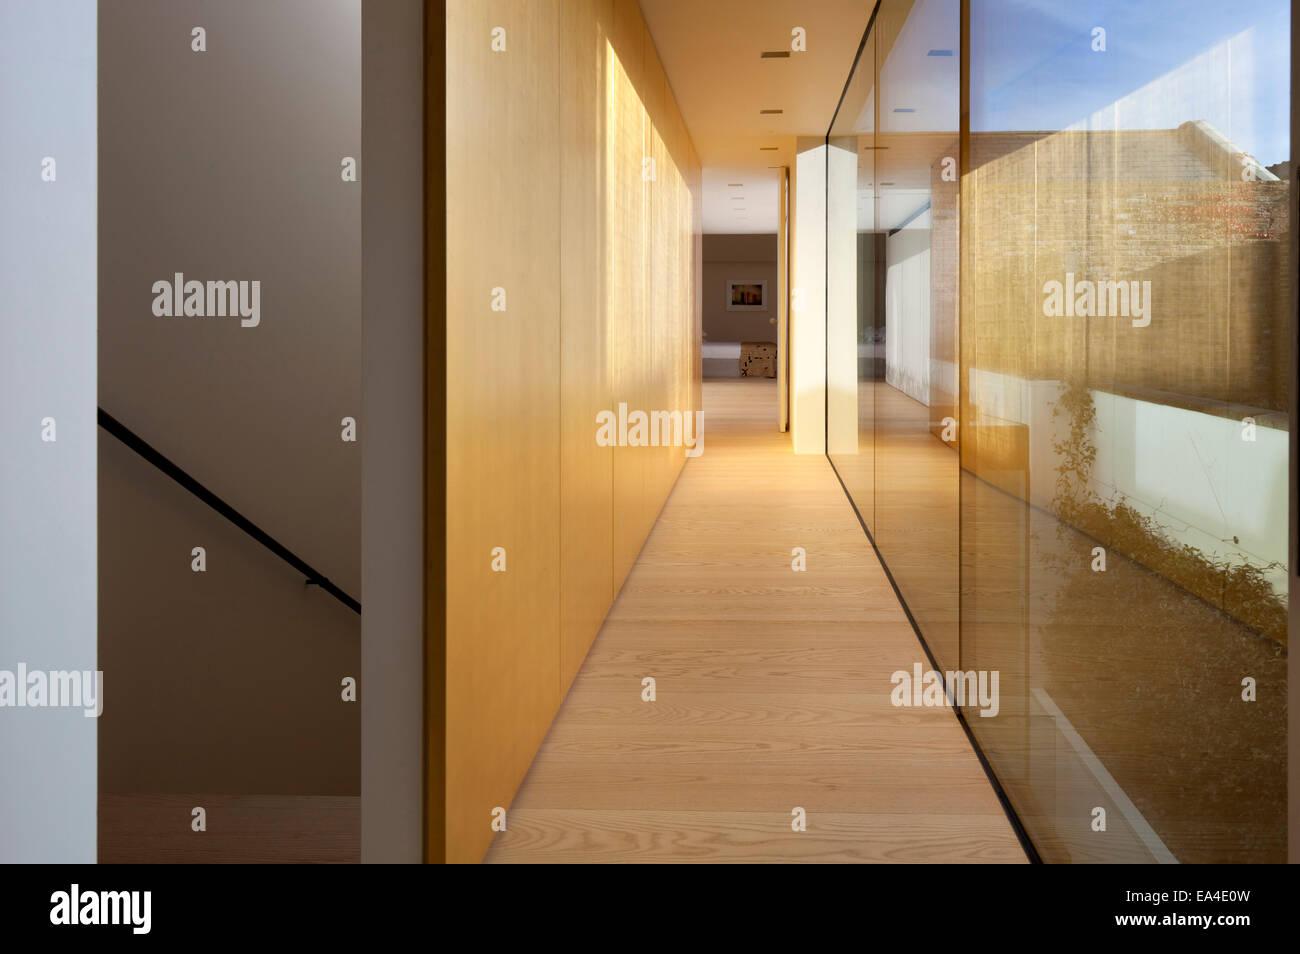 Interior hallway of Notting Hill townhouse, London, UK. - Stock Image